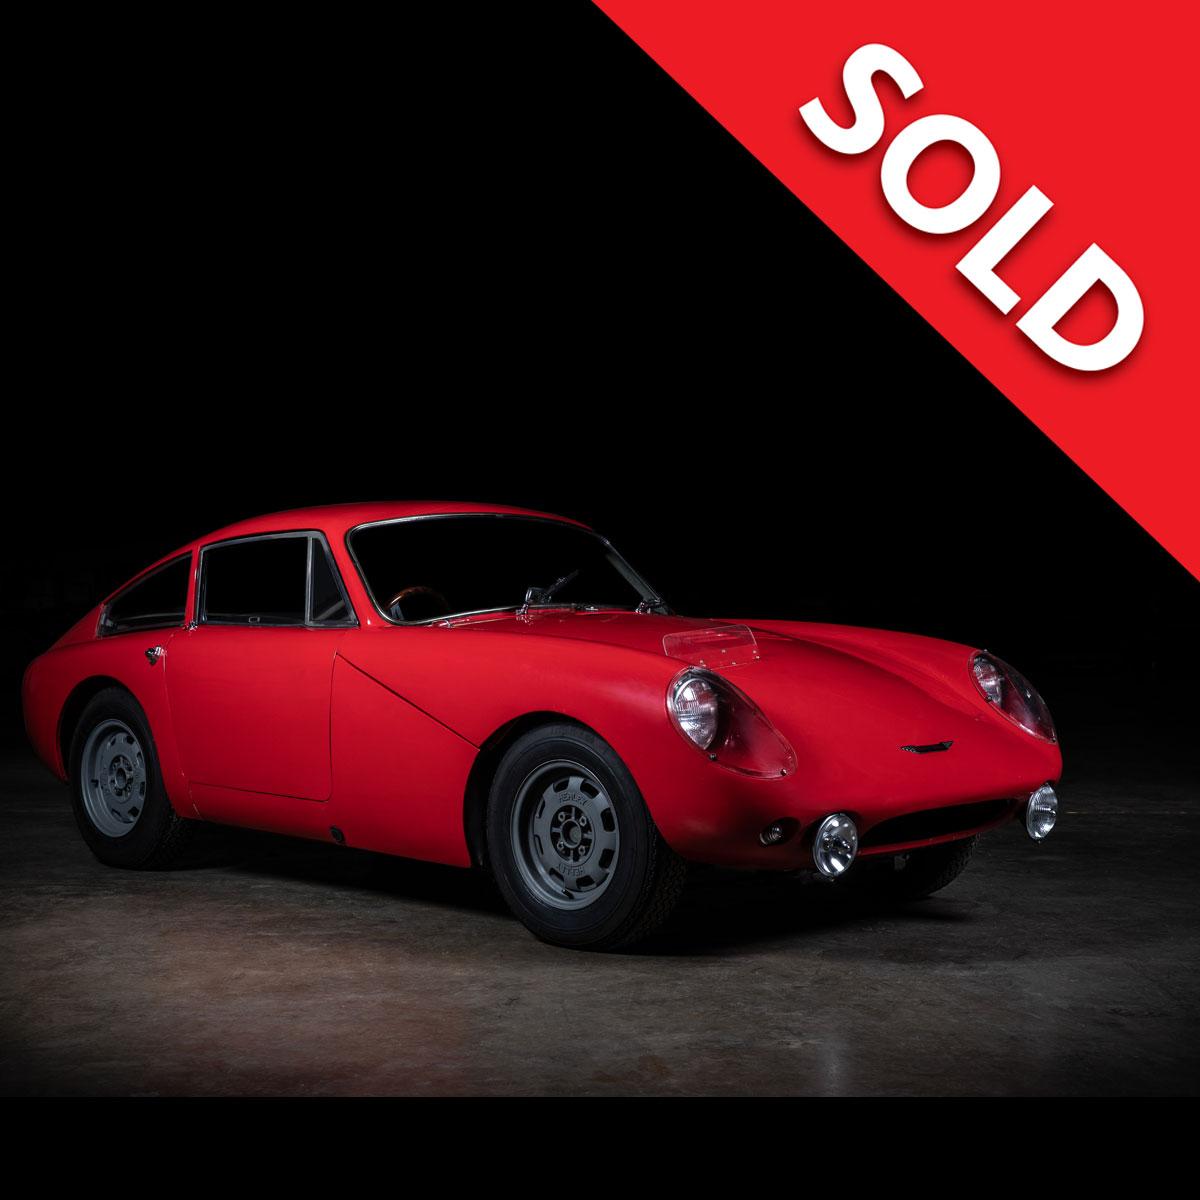 Sold – 1964 Austin Healey Sebring Sprite